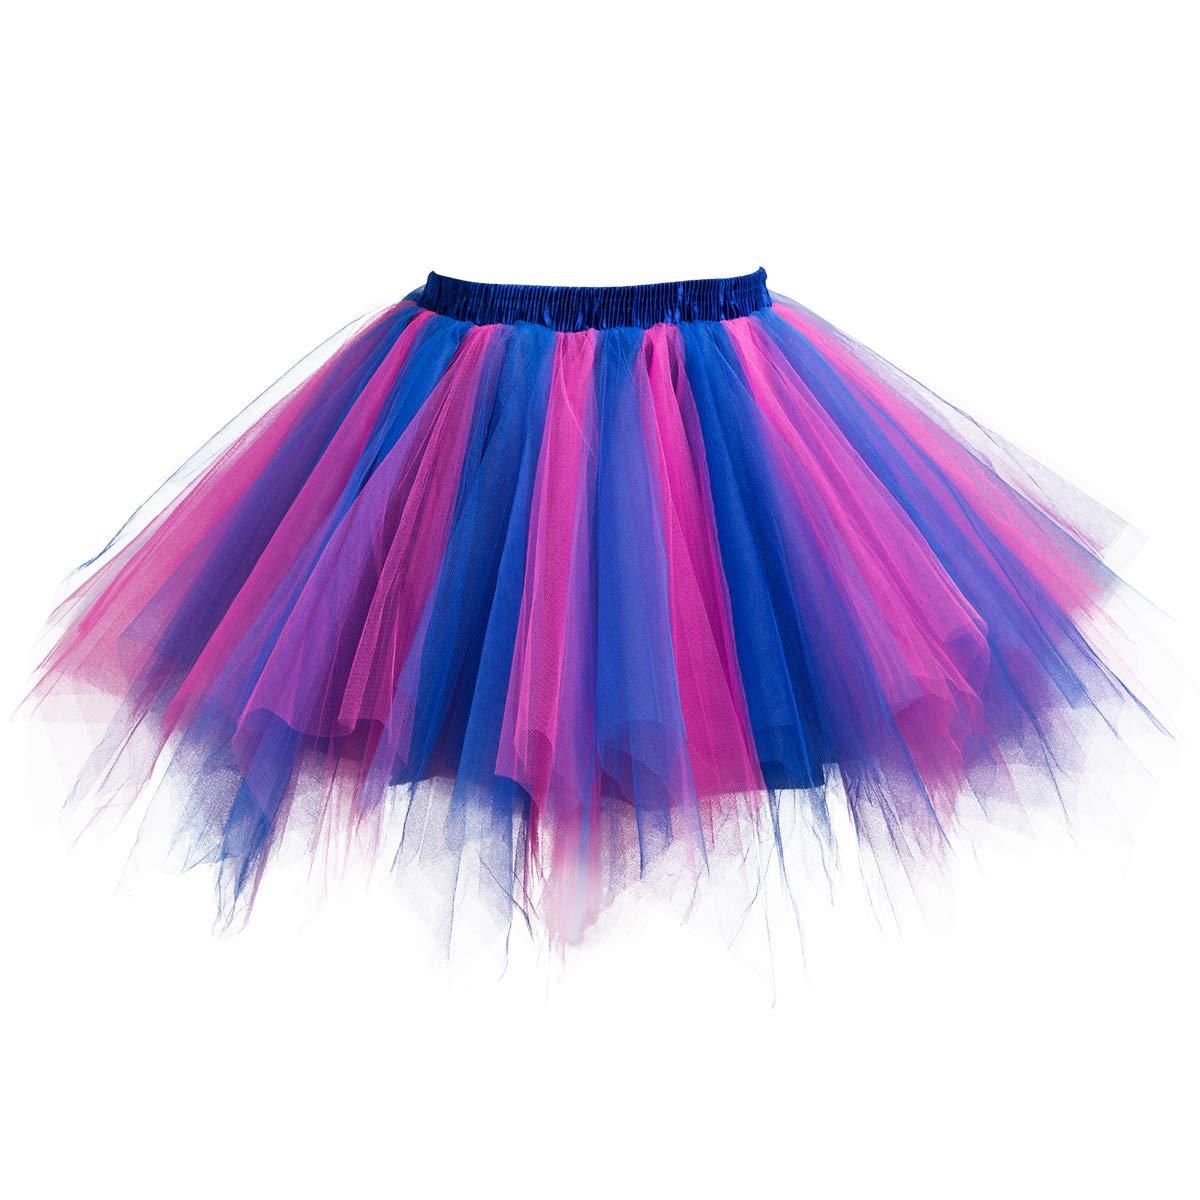 C-Oral Petticoat Unterrock 50er Reifrock Underskirt Crinoline Damenrock für Rockabilly Kleid SFD